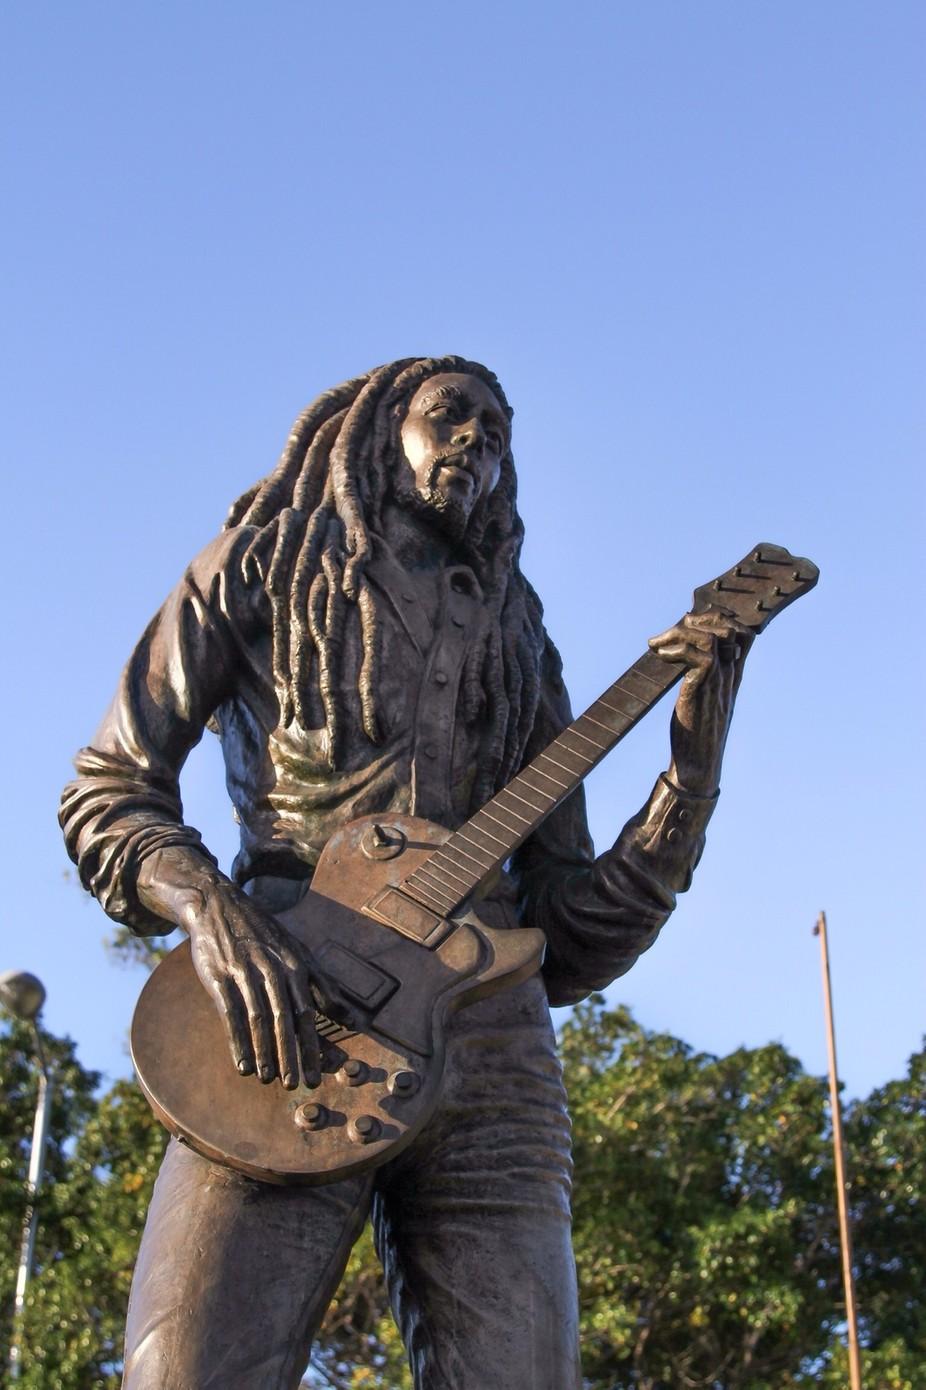 Statue of  reggae legend Bob Marley in park in JA